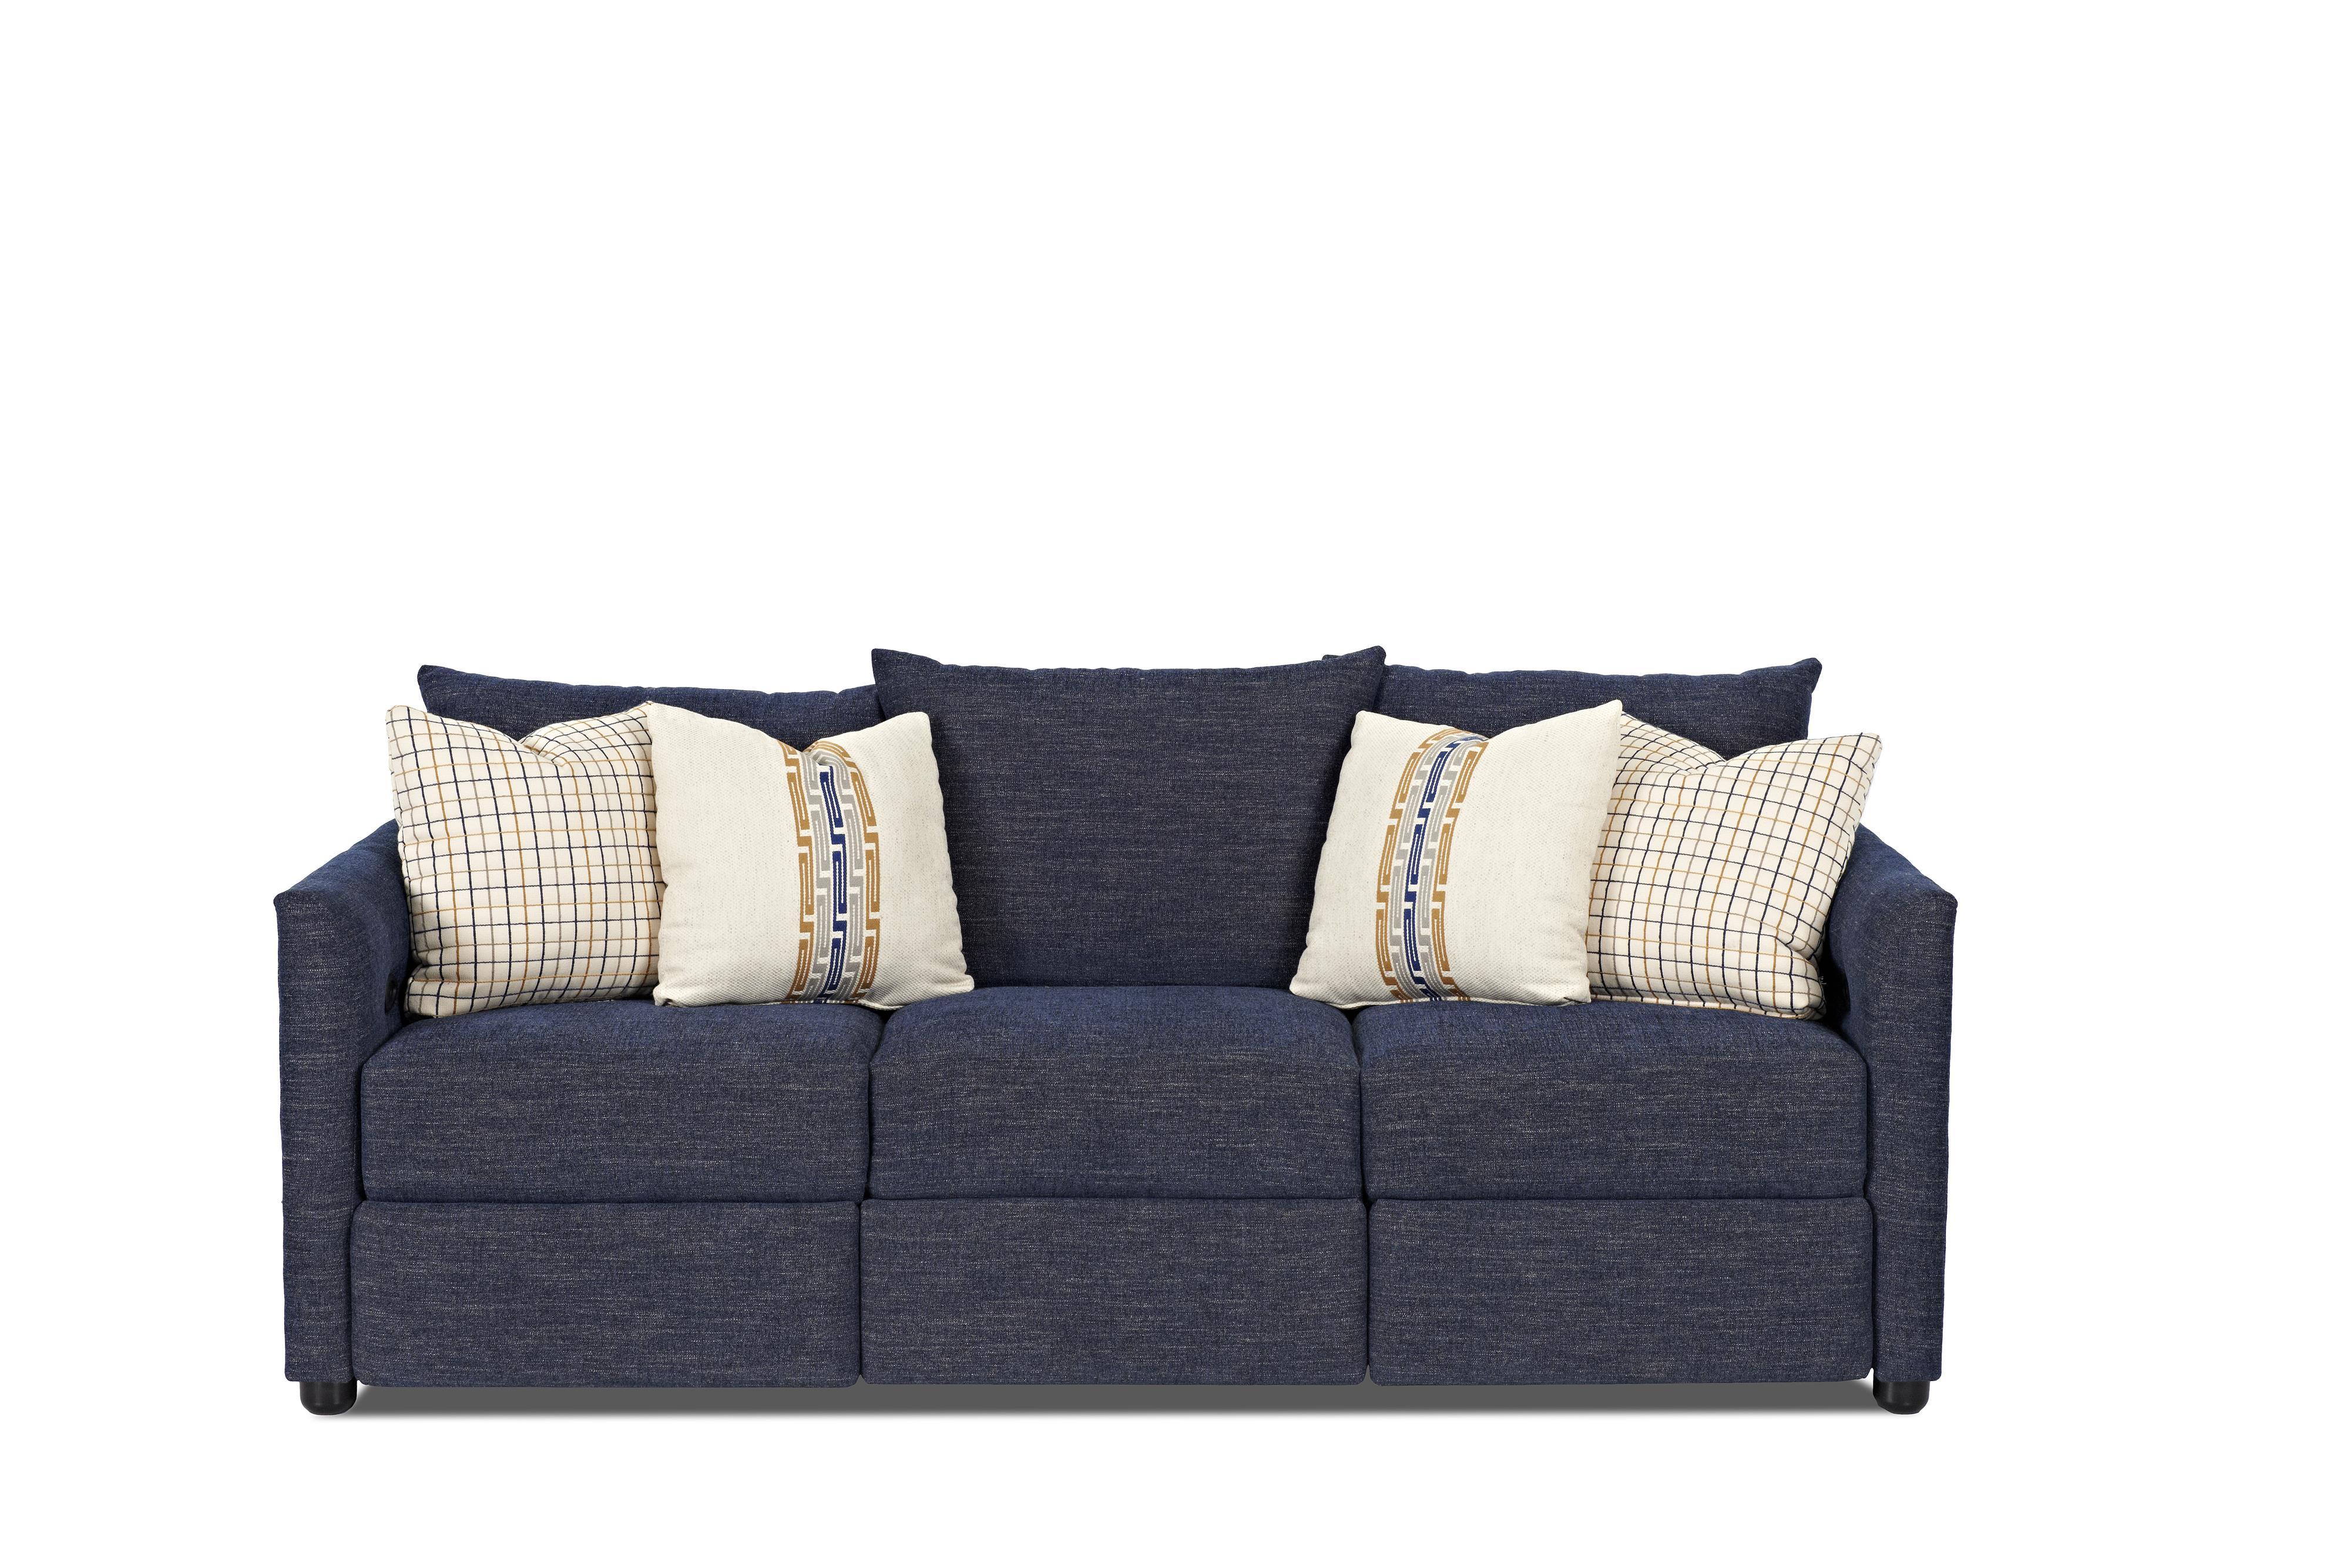 Atlanta Power Reclining Sofa by Klaussner at Johnny Janosik